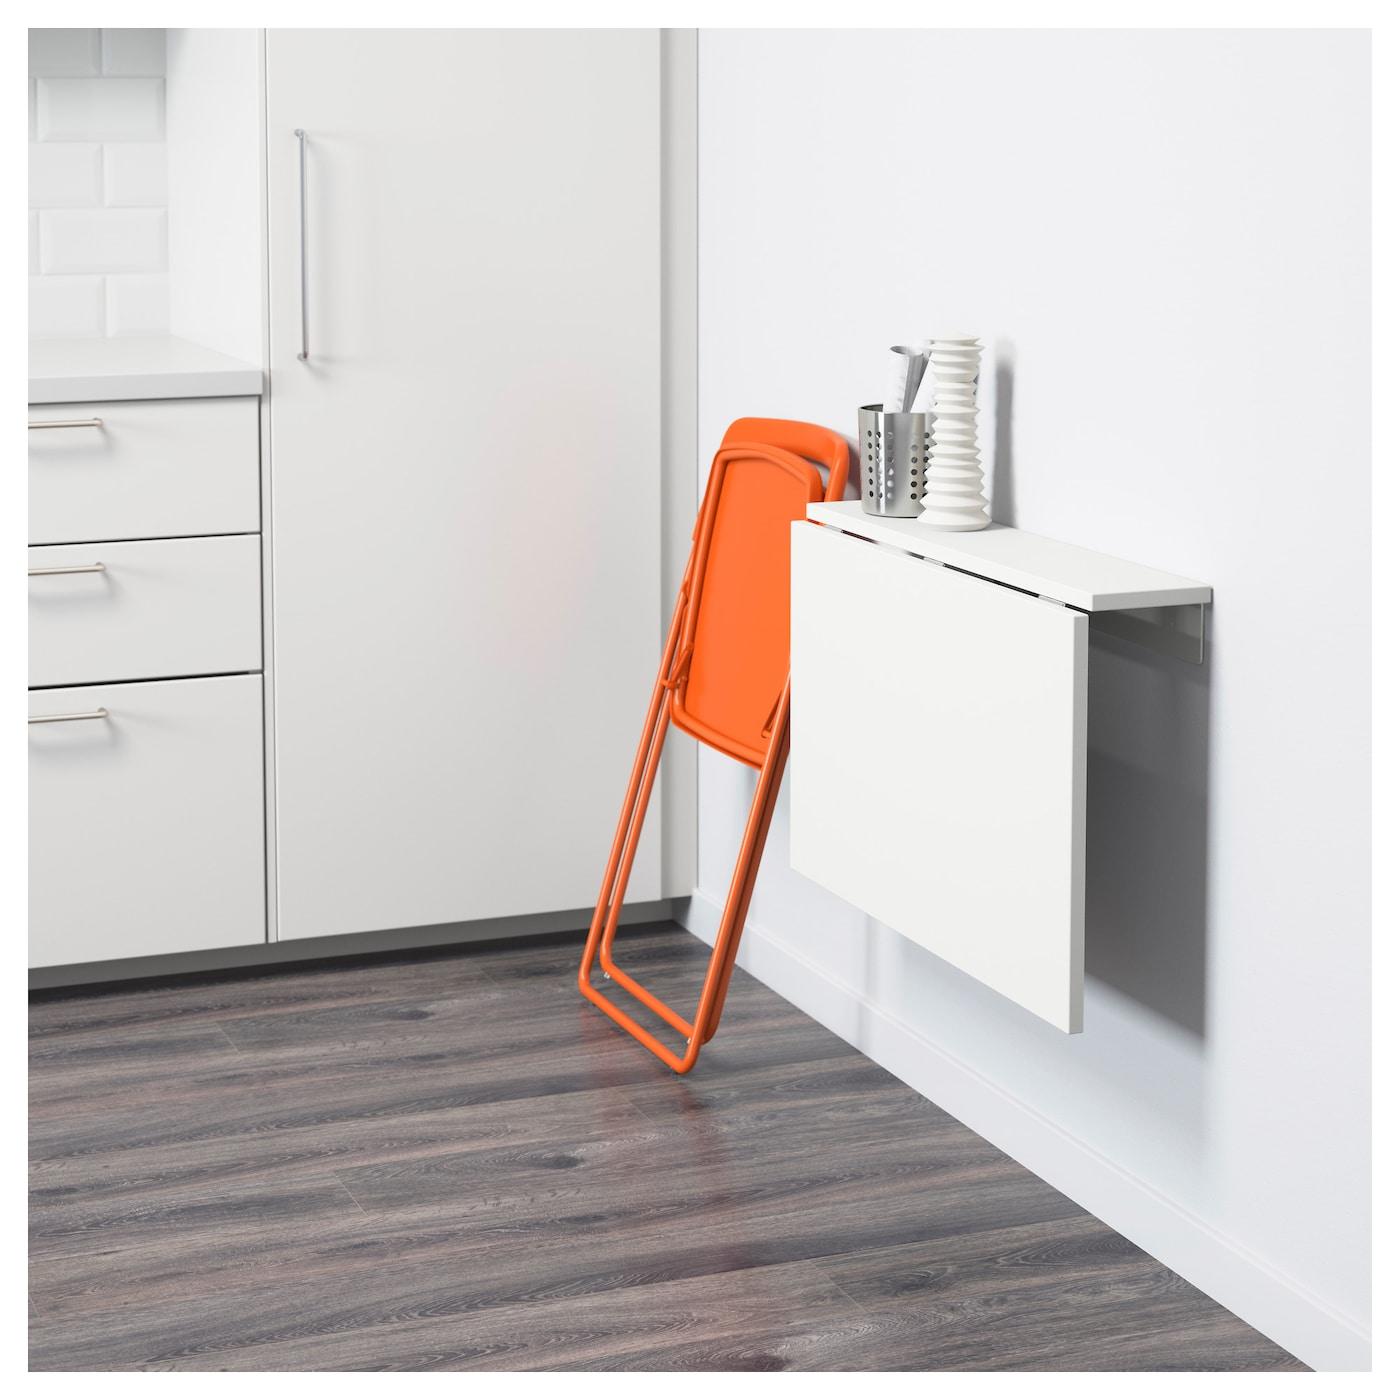 nisse norberg table et 1 chaise blanc orange 74 cm ikea. Black Bedroom Furniture Sets. Home Design Ideas